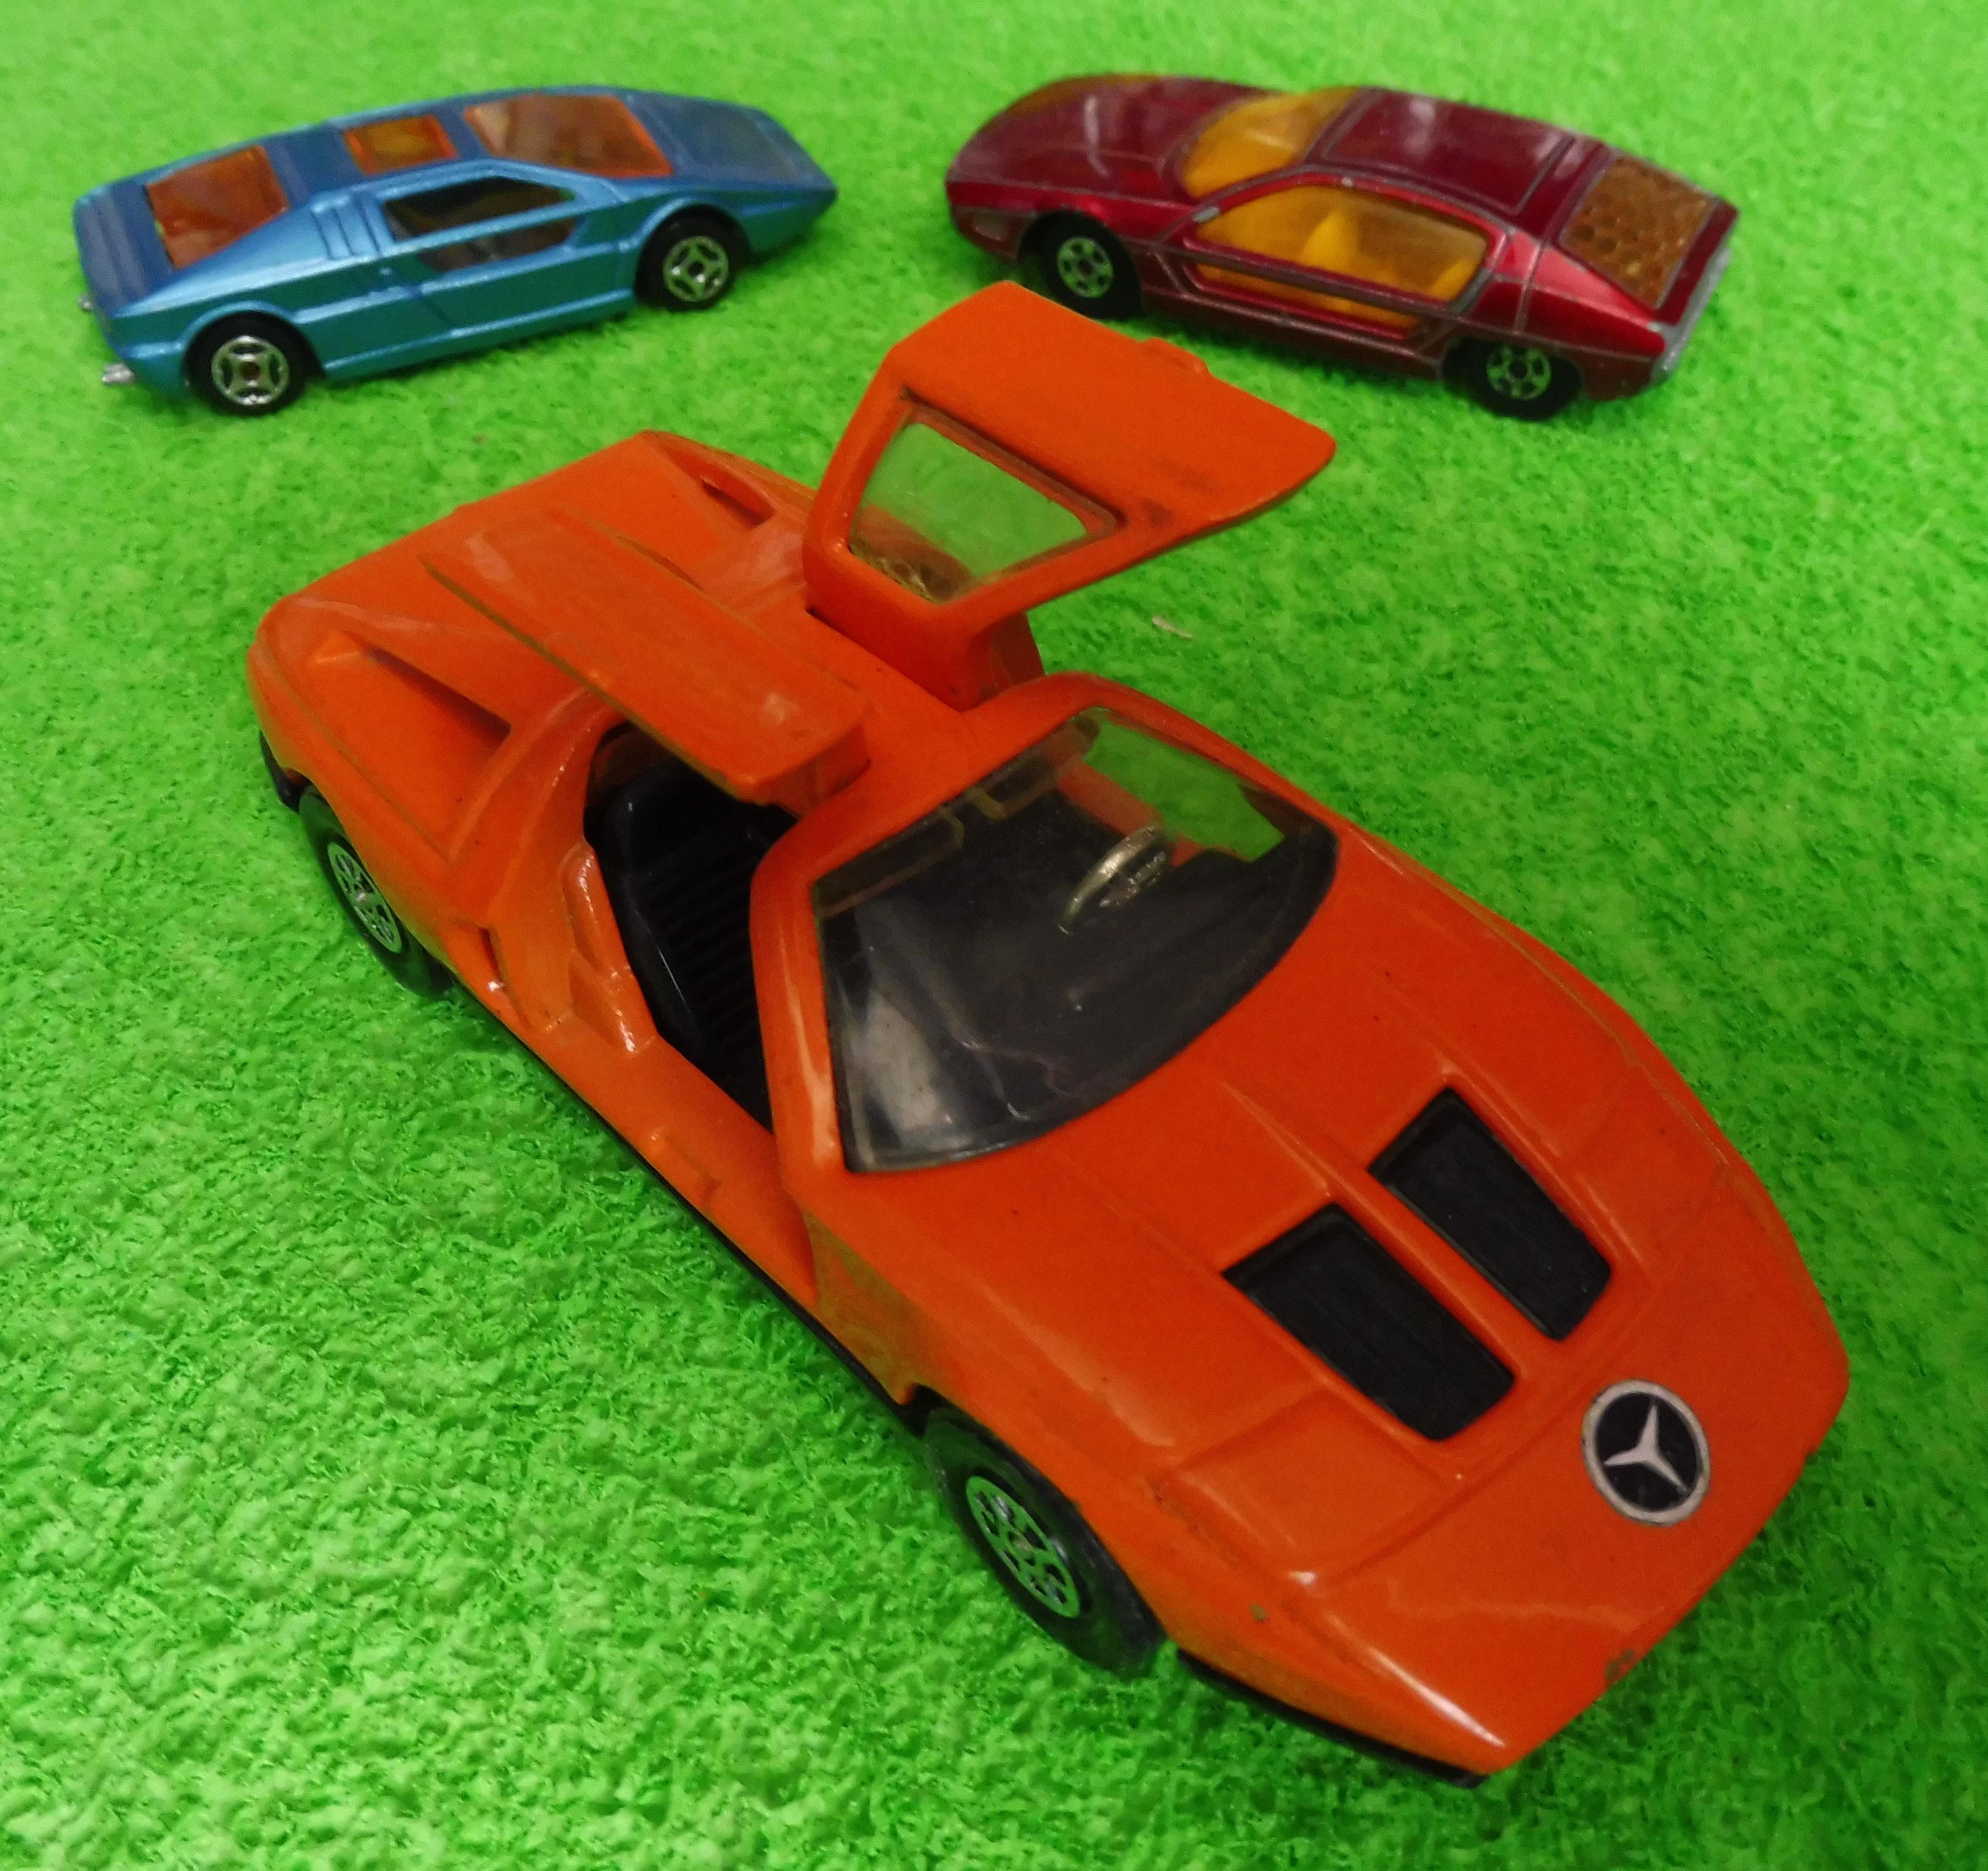 Concept Cars Mercedes C111 Lamborghini Marzal and Maserati Boomerang